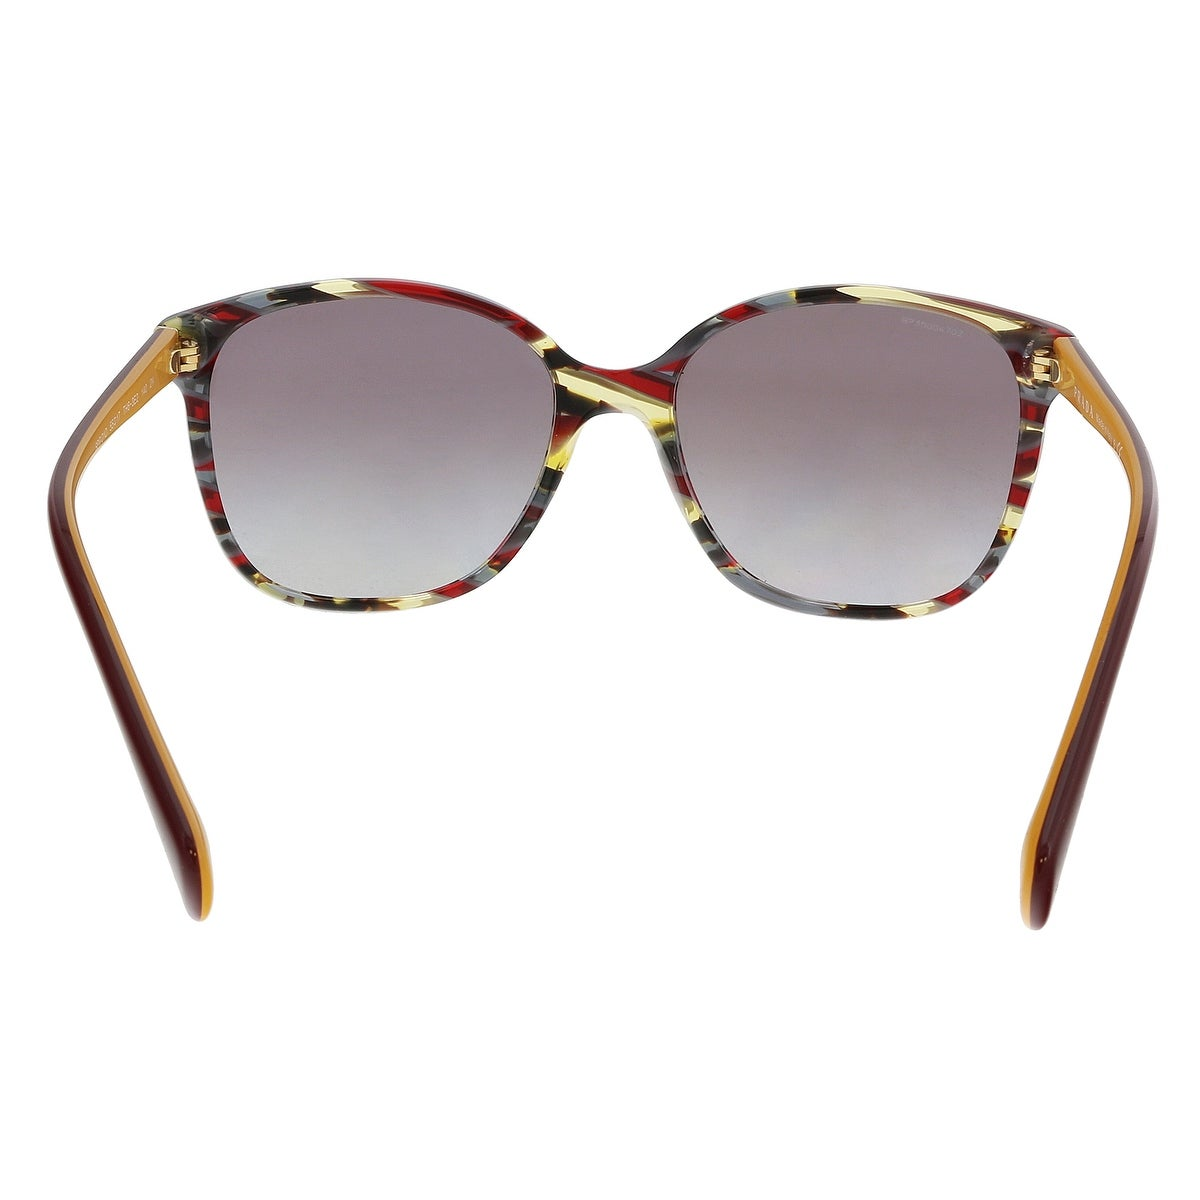 1fe5295529e57 Shop Prada PR01OS TH63E2 Havana   Ears bord yellow Square Sunglasses -  55-17-140 - Free Shipping Today - Overstock - 21158249